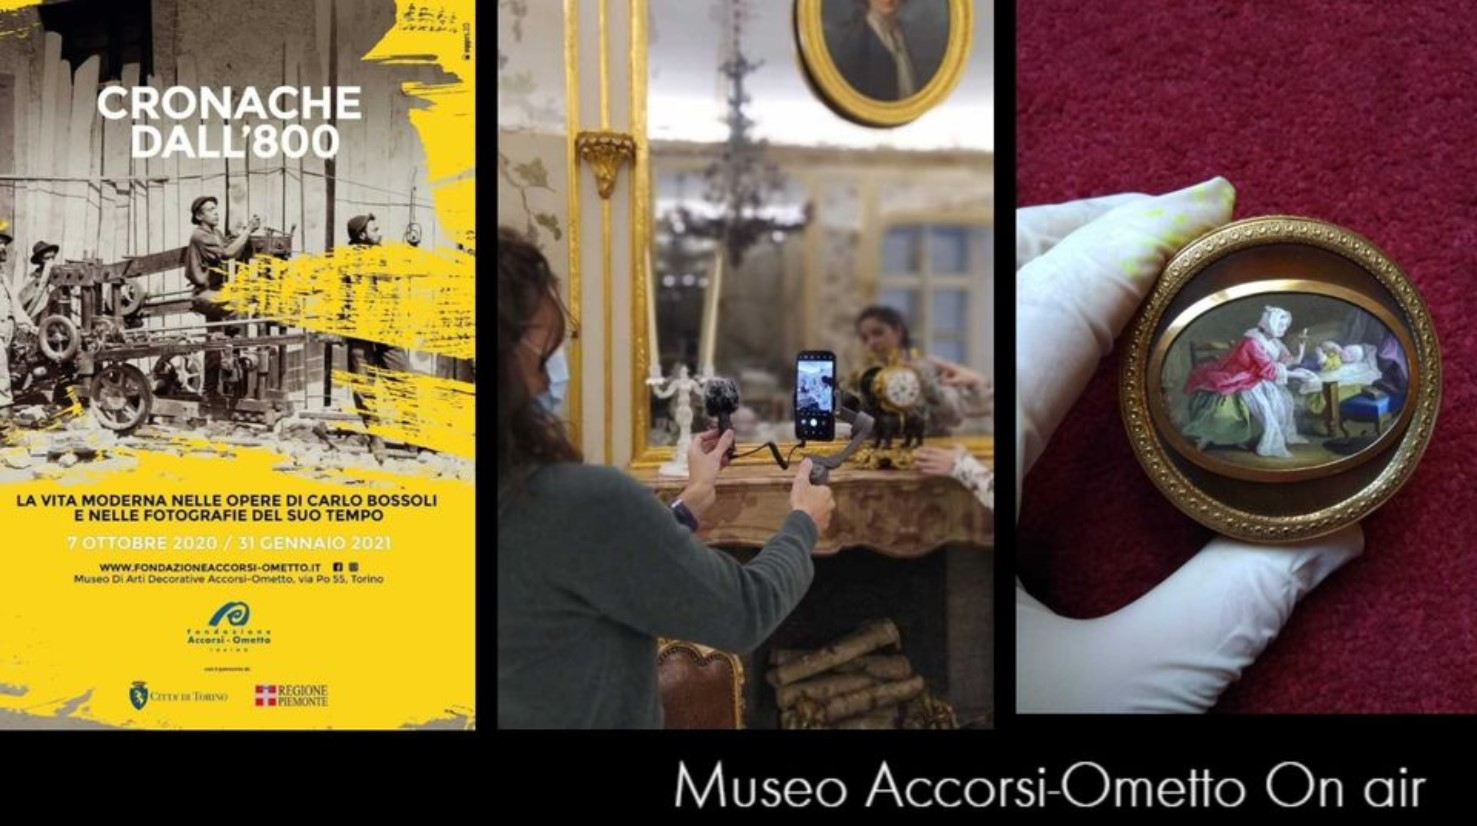 http://www.icom-italia.org/wp-content/uploads/wpforms/10320-346379fc8433371d8ed056fee97d2a28/Museo-social-e-open-e785bdce336bee3c04e76a2220db8691.jpg